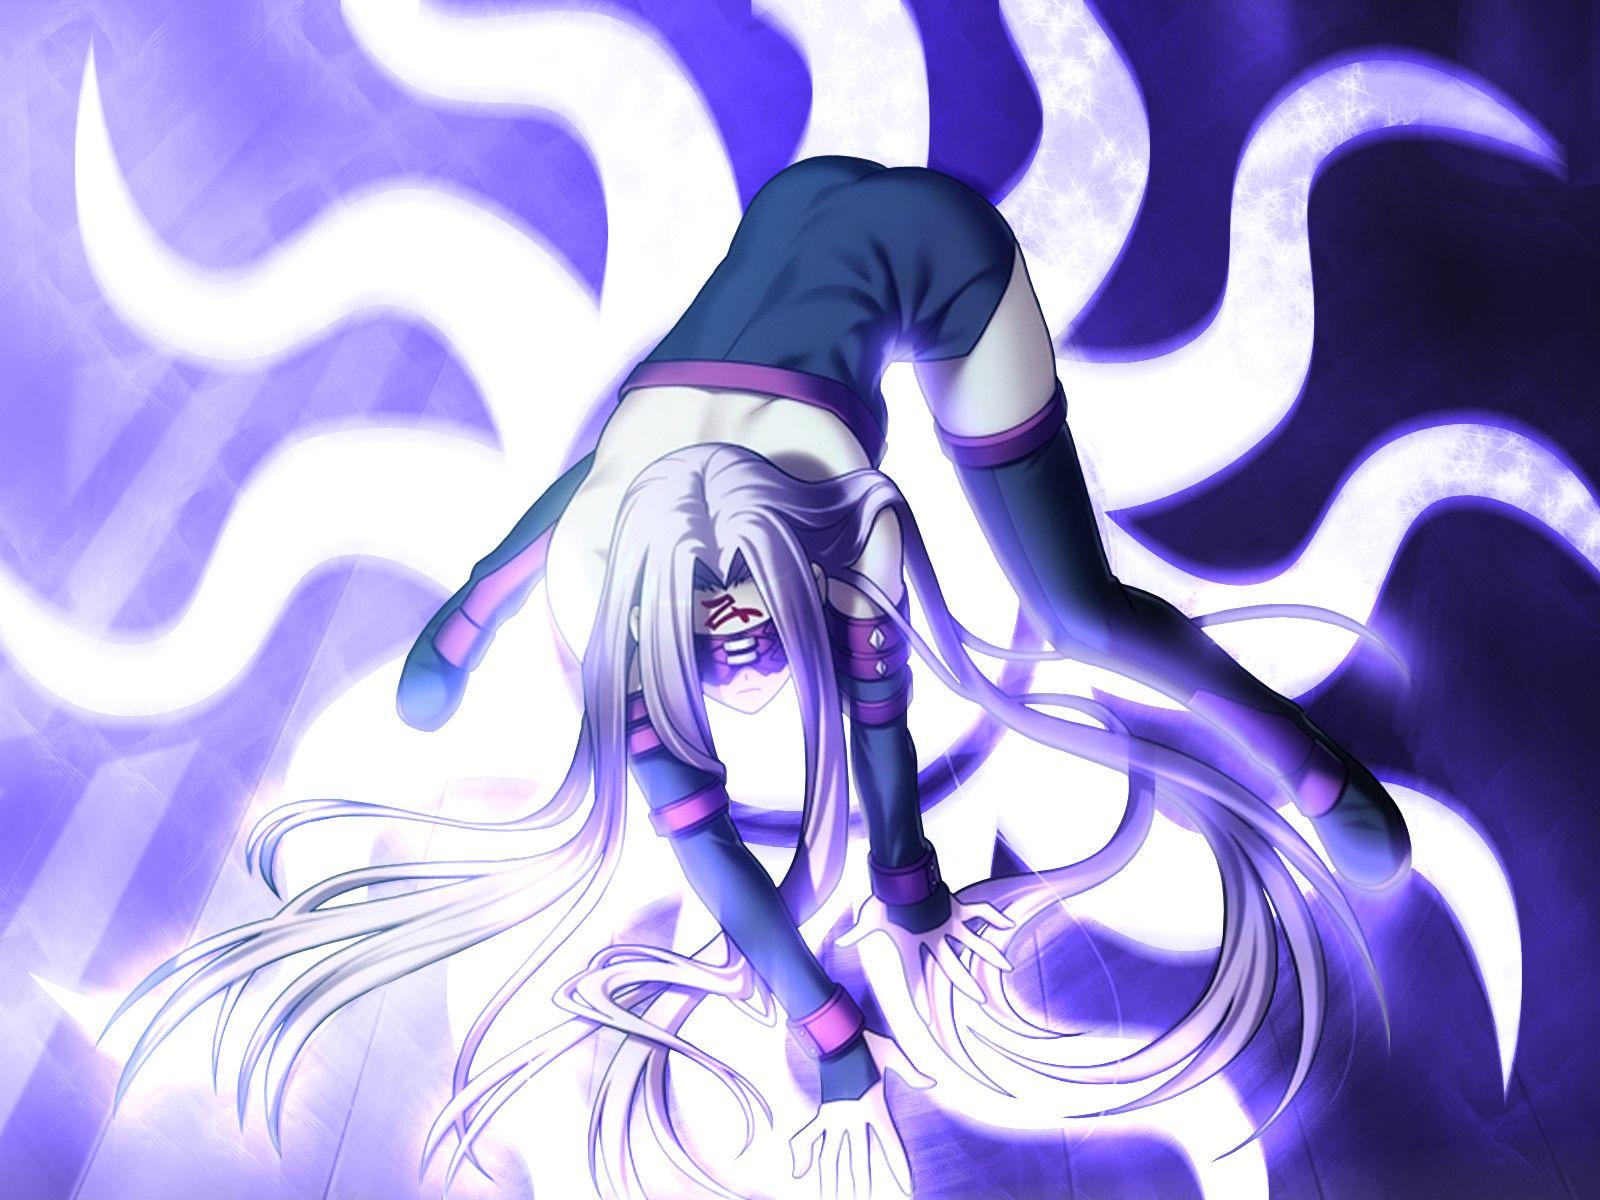 Minitokyo_Fate-Stay_Night_Wallpapers_239677.jpg